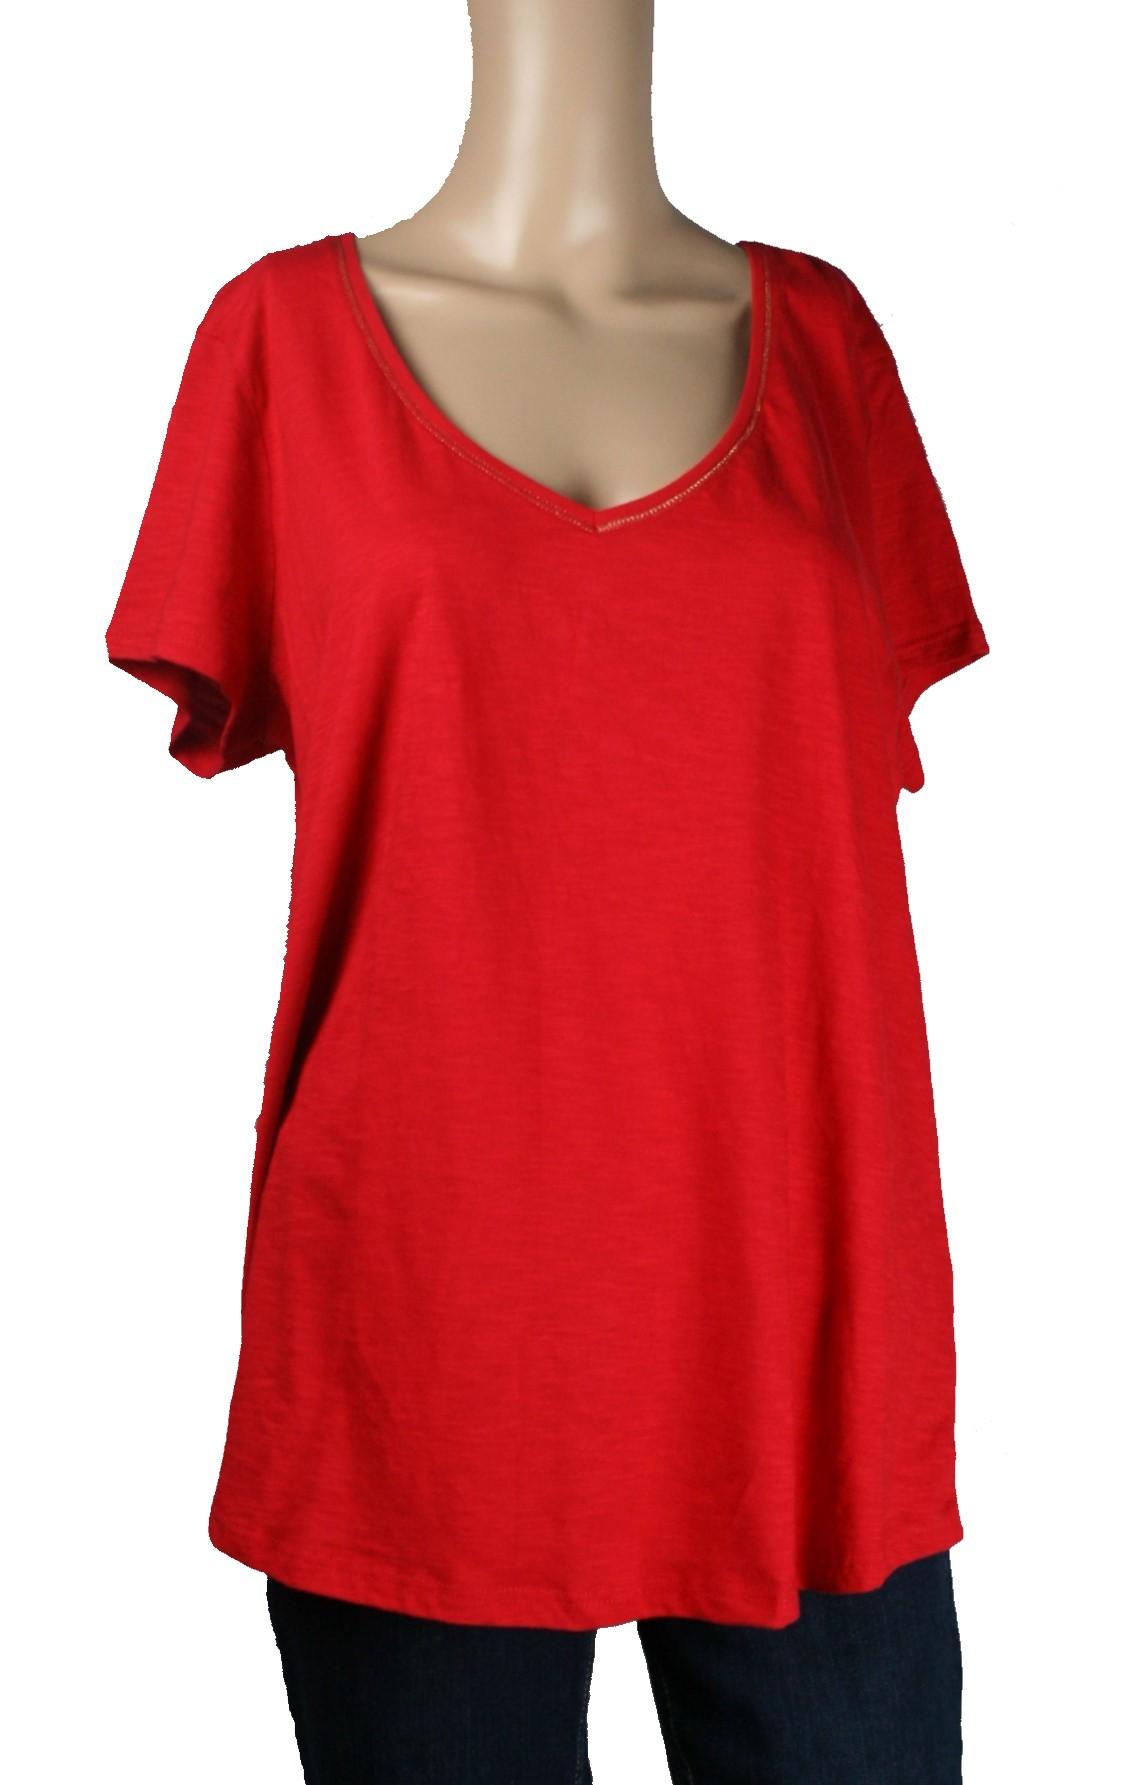 T-shirt Grain de Malice -  Taille XL